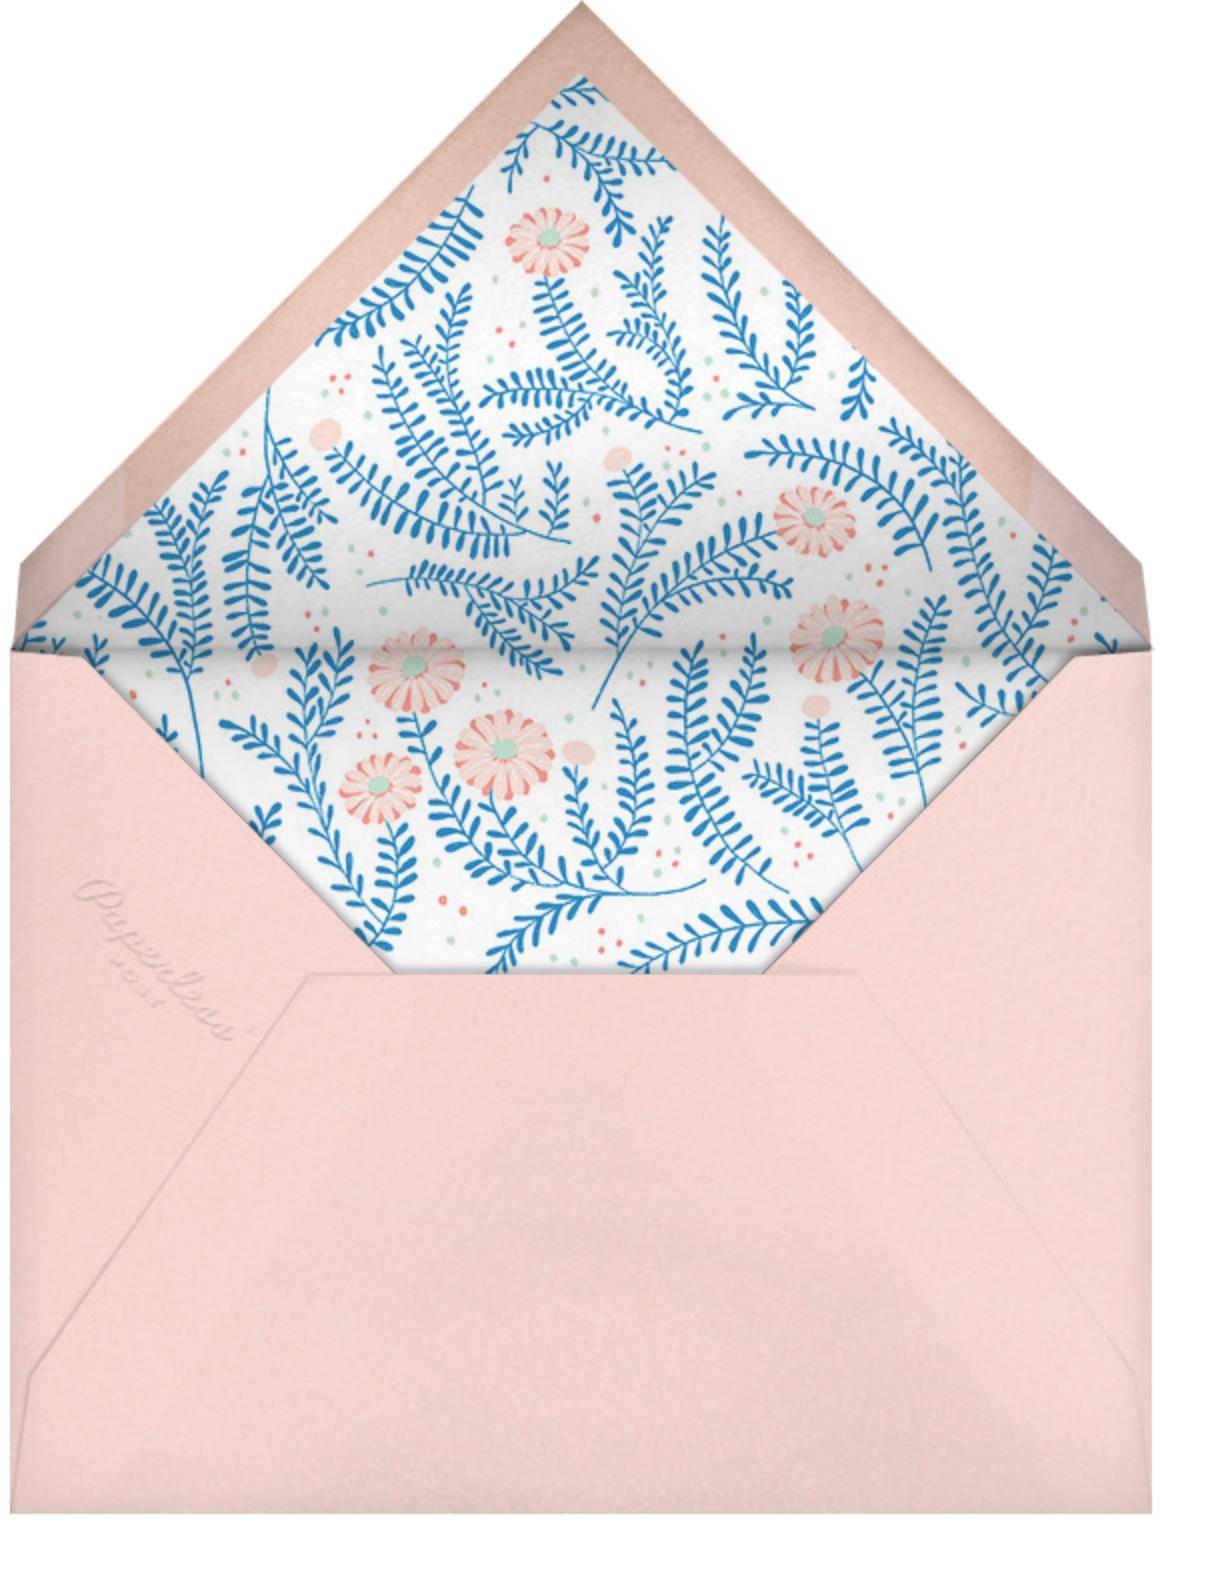 Lady Potts' Cosy - Paperless Post - Brunch - envelope back